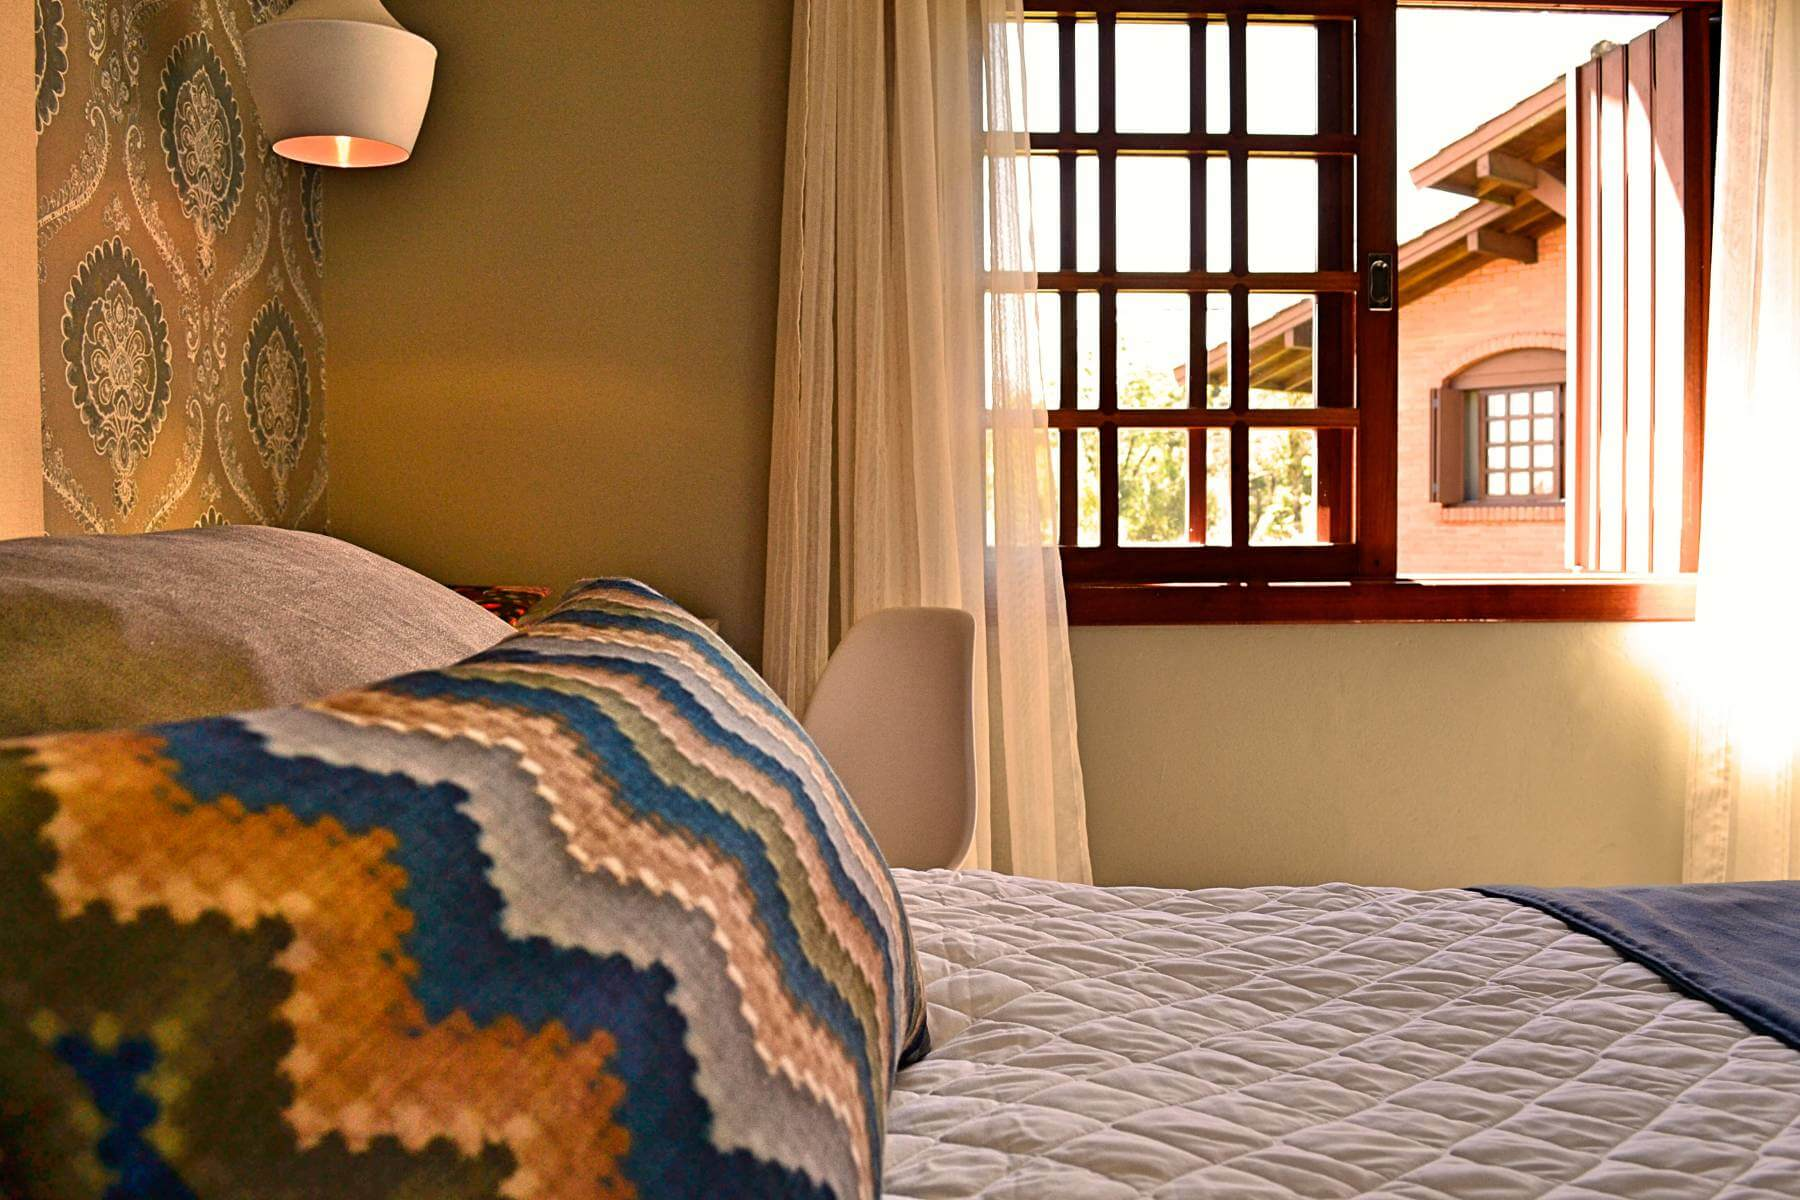 Bangalô Amor Perfeito - Hotel Bangalôs da Serra #CurtaSuaFamilia #HotelSustentavel #TurismoVerde #TravelersChoice #EcoLider #Gramado